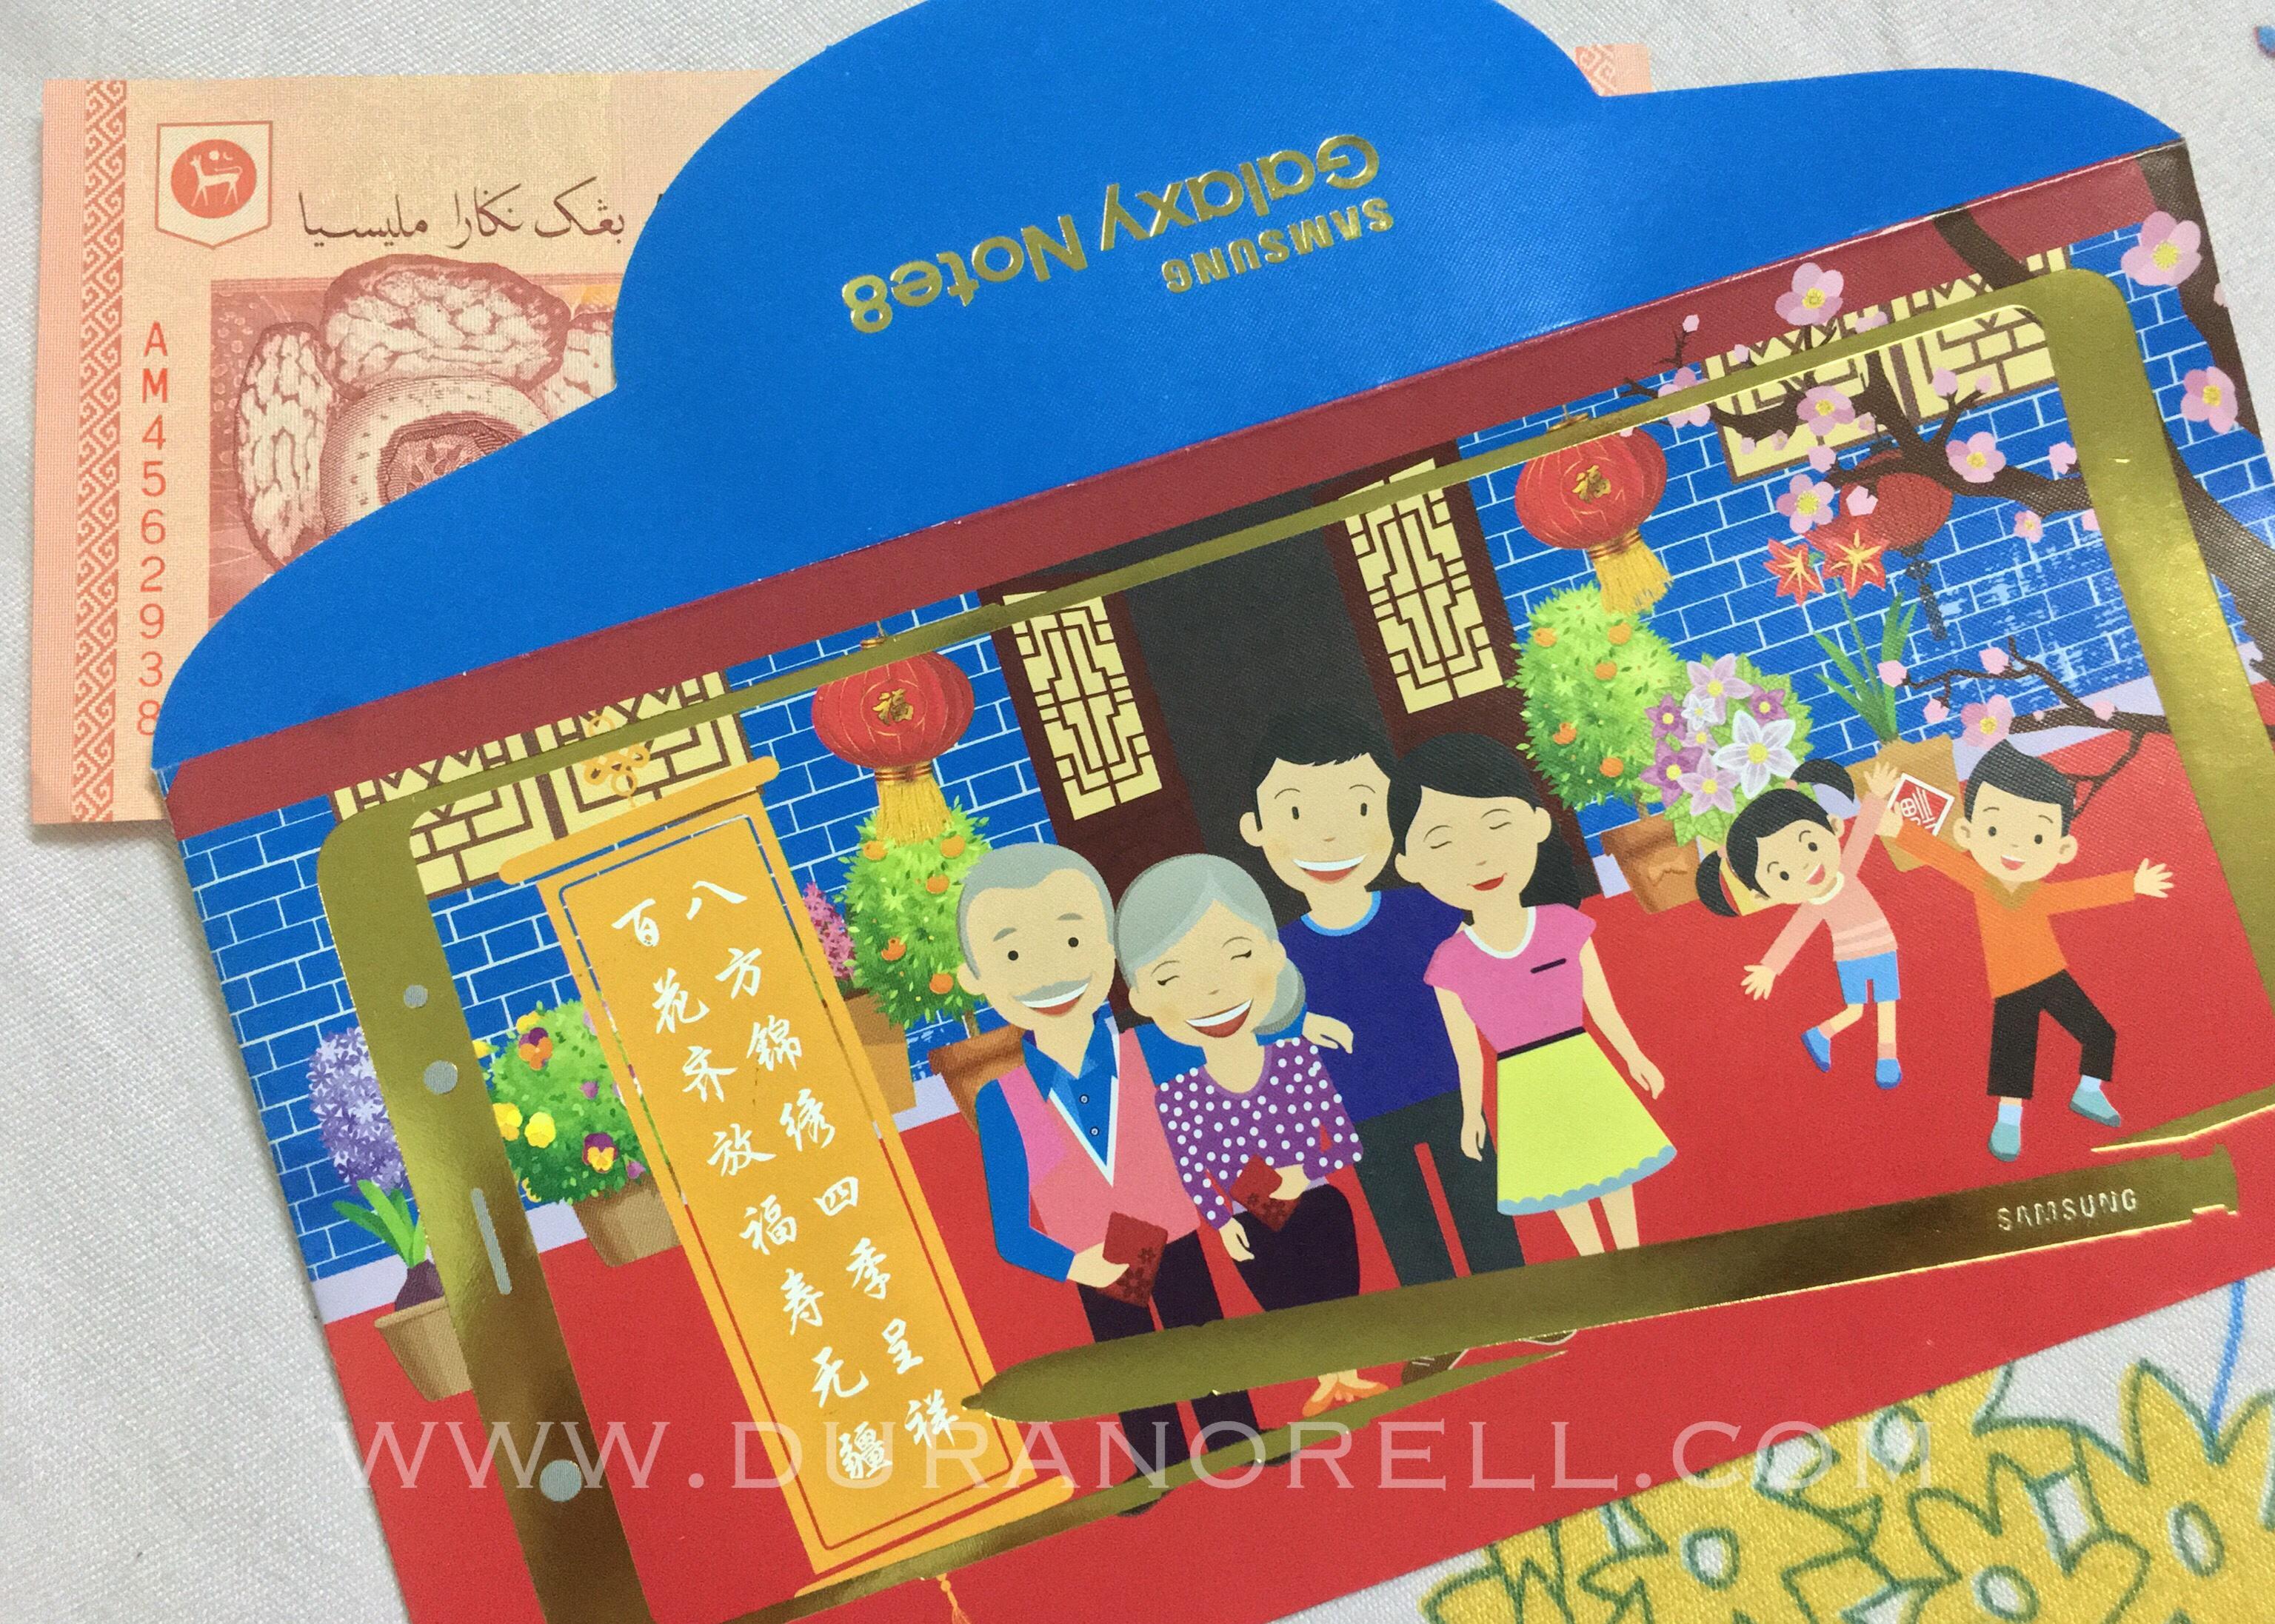 Duranorell.com | Chinese New Year Angpow, Angpow Raya Cina, CNY2018